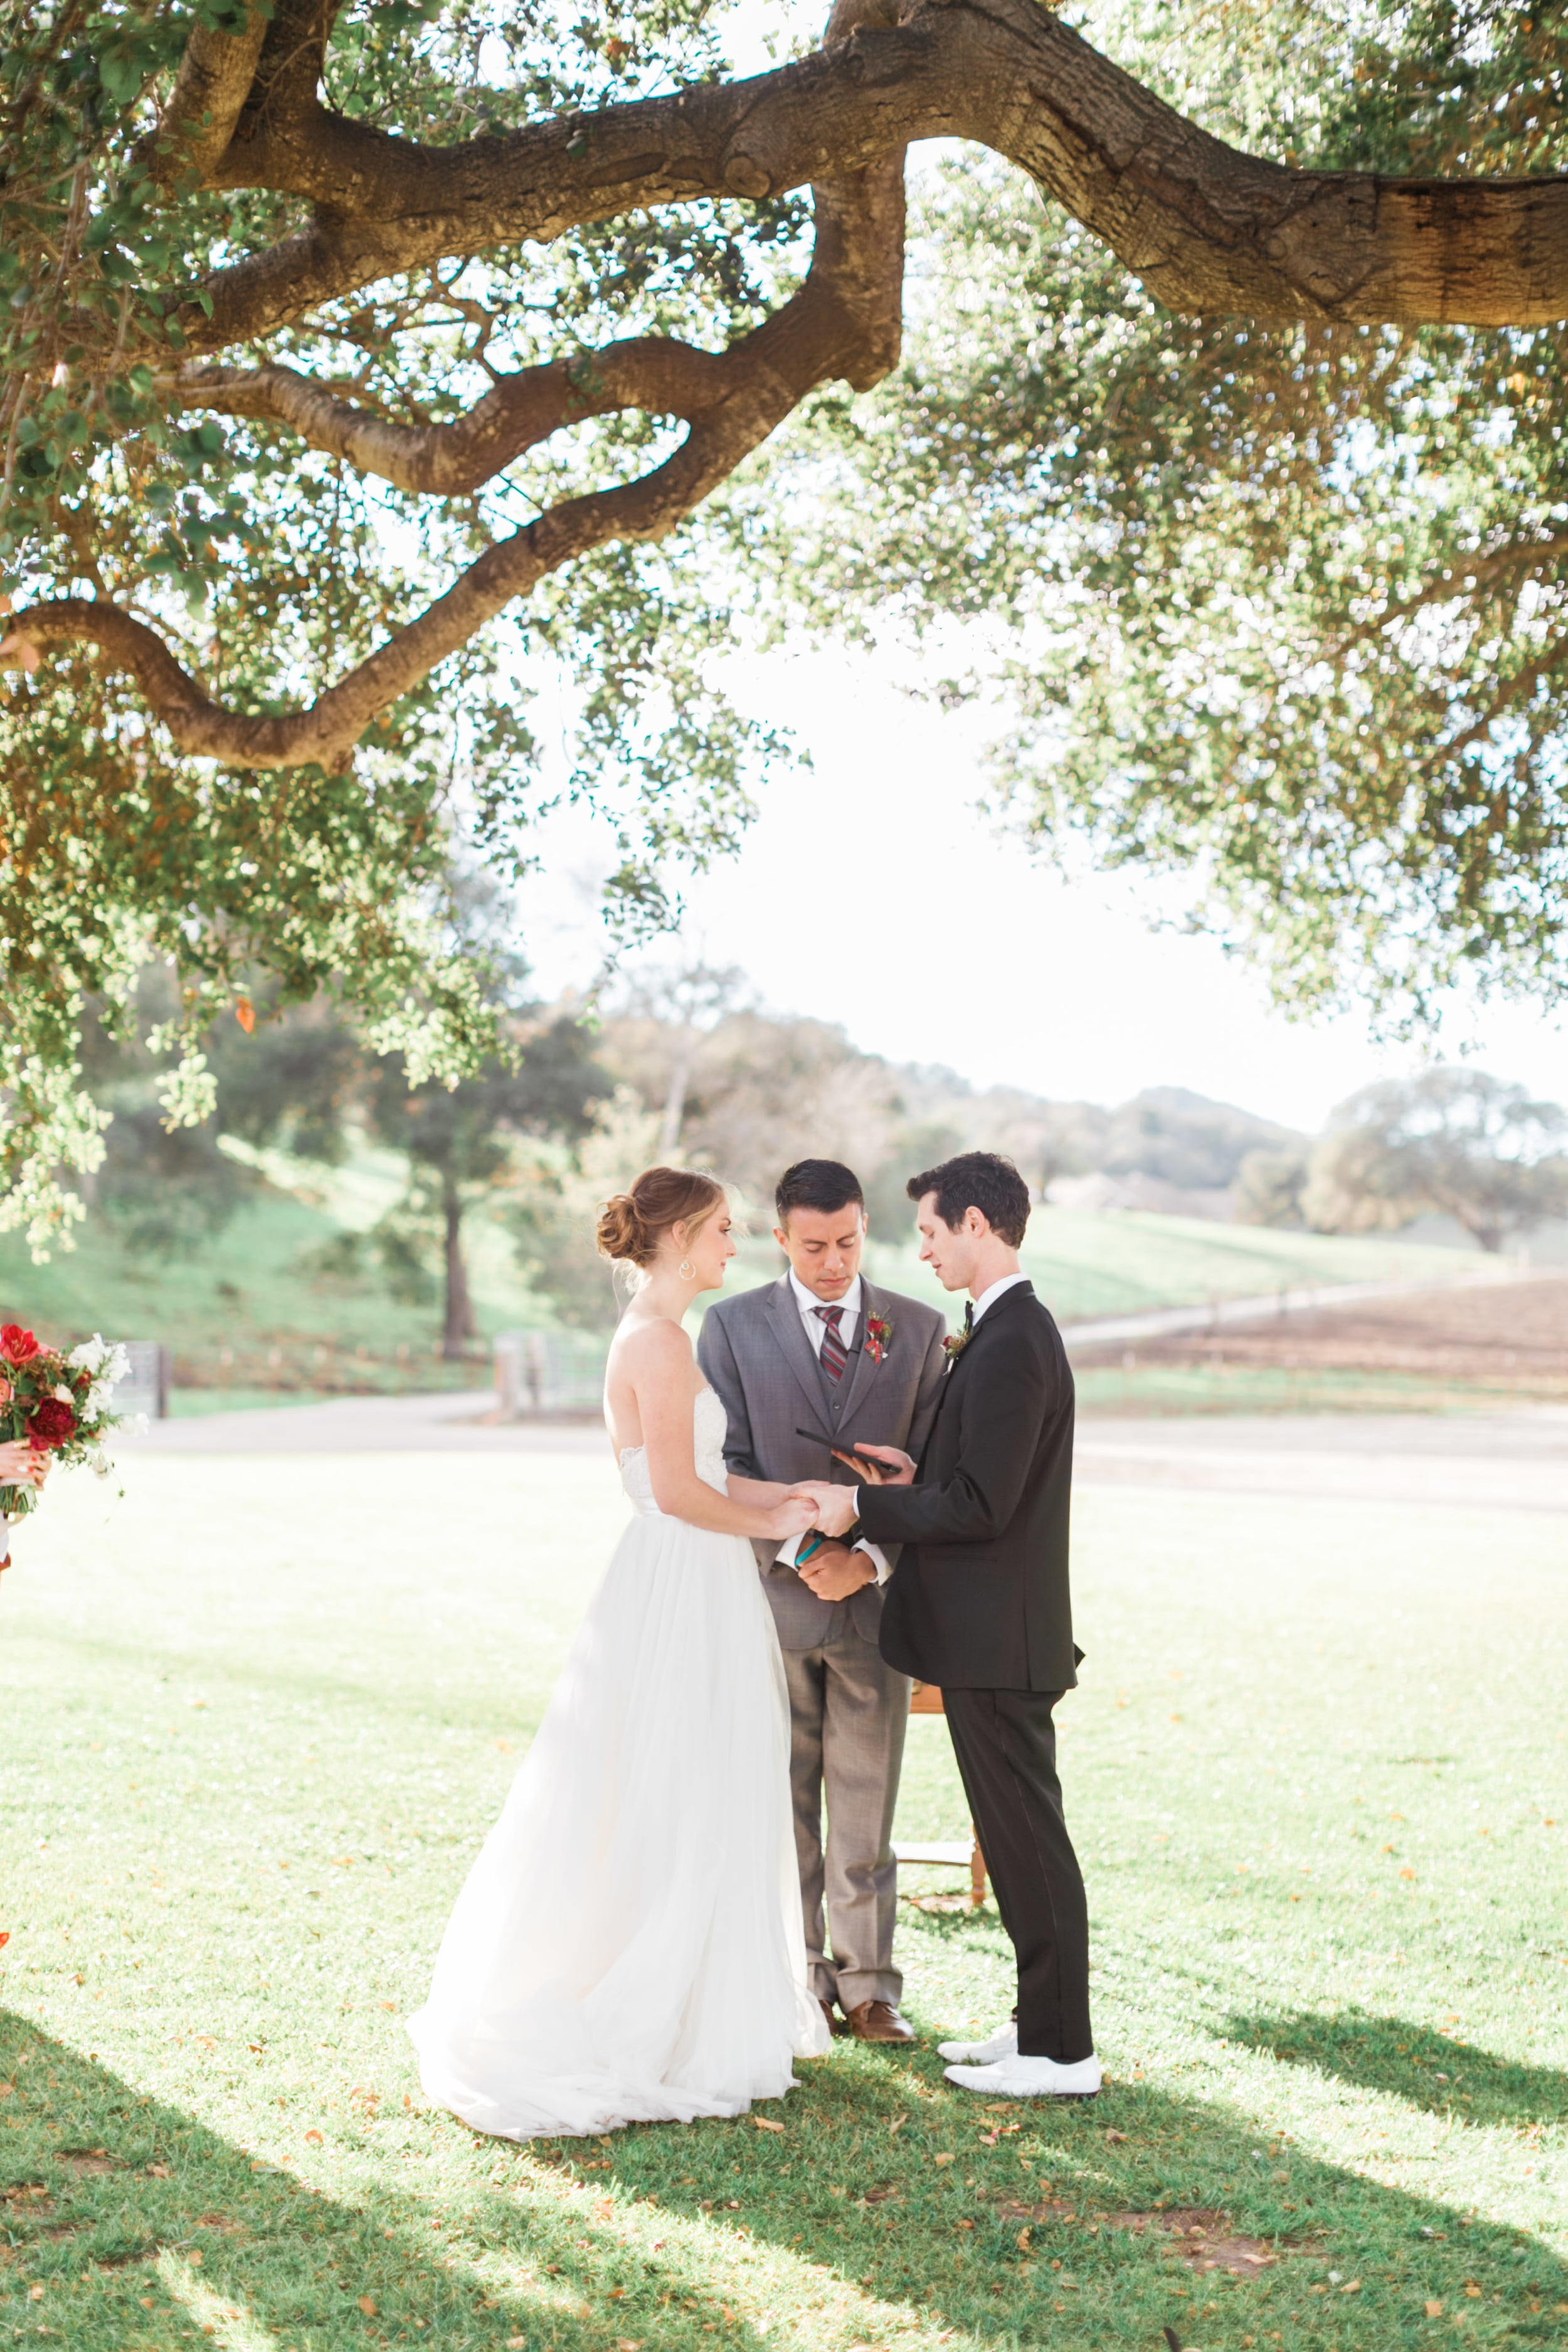 Natalie_Schutt_Photography_Winter_Wedding_San_Luis_Obispo-126.jpg